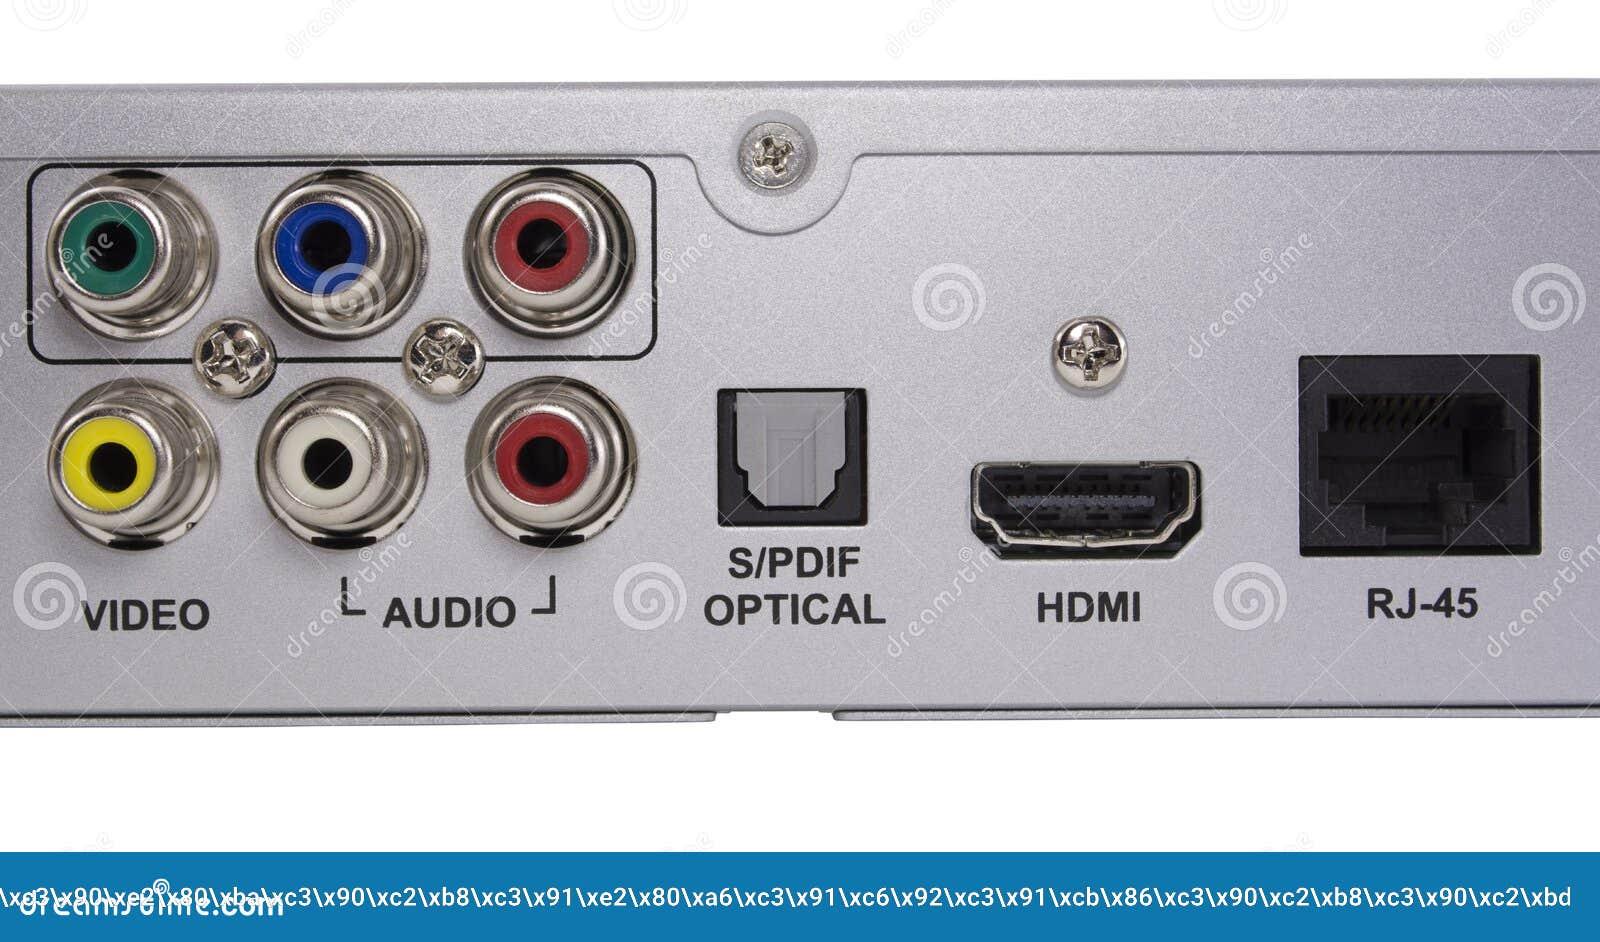 Audio video Inputs